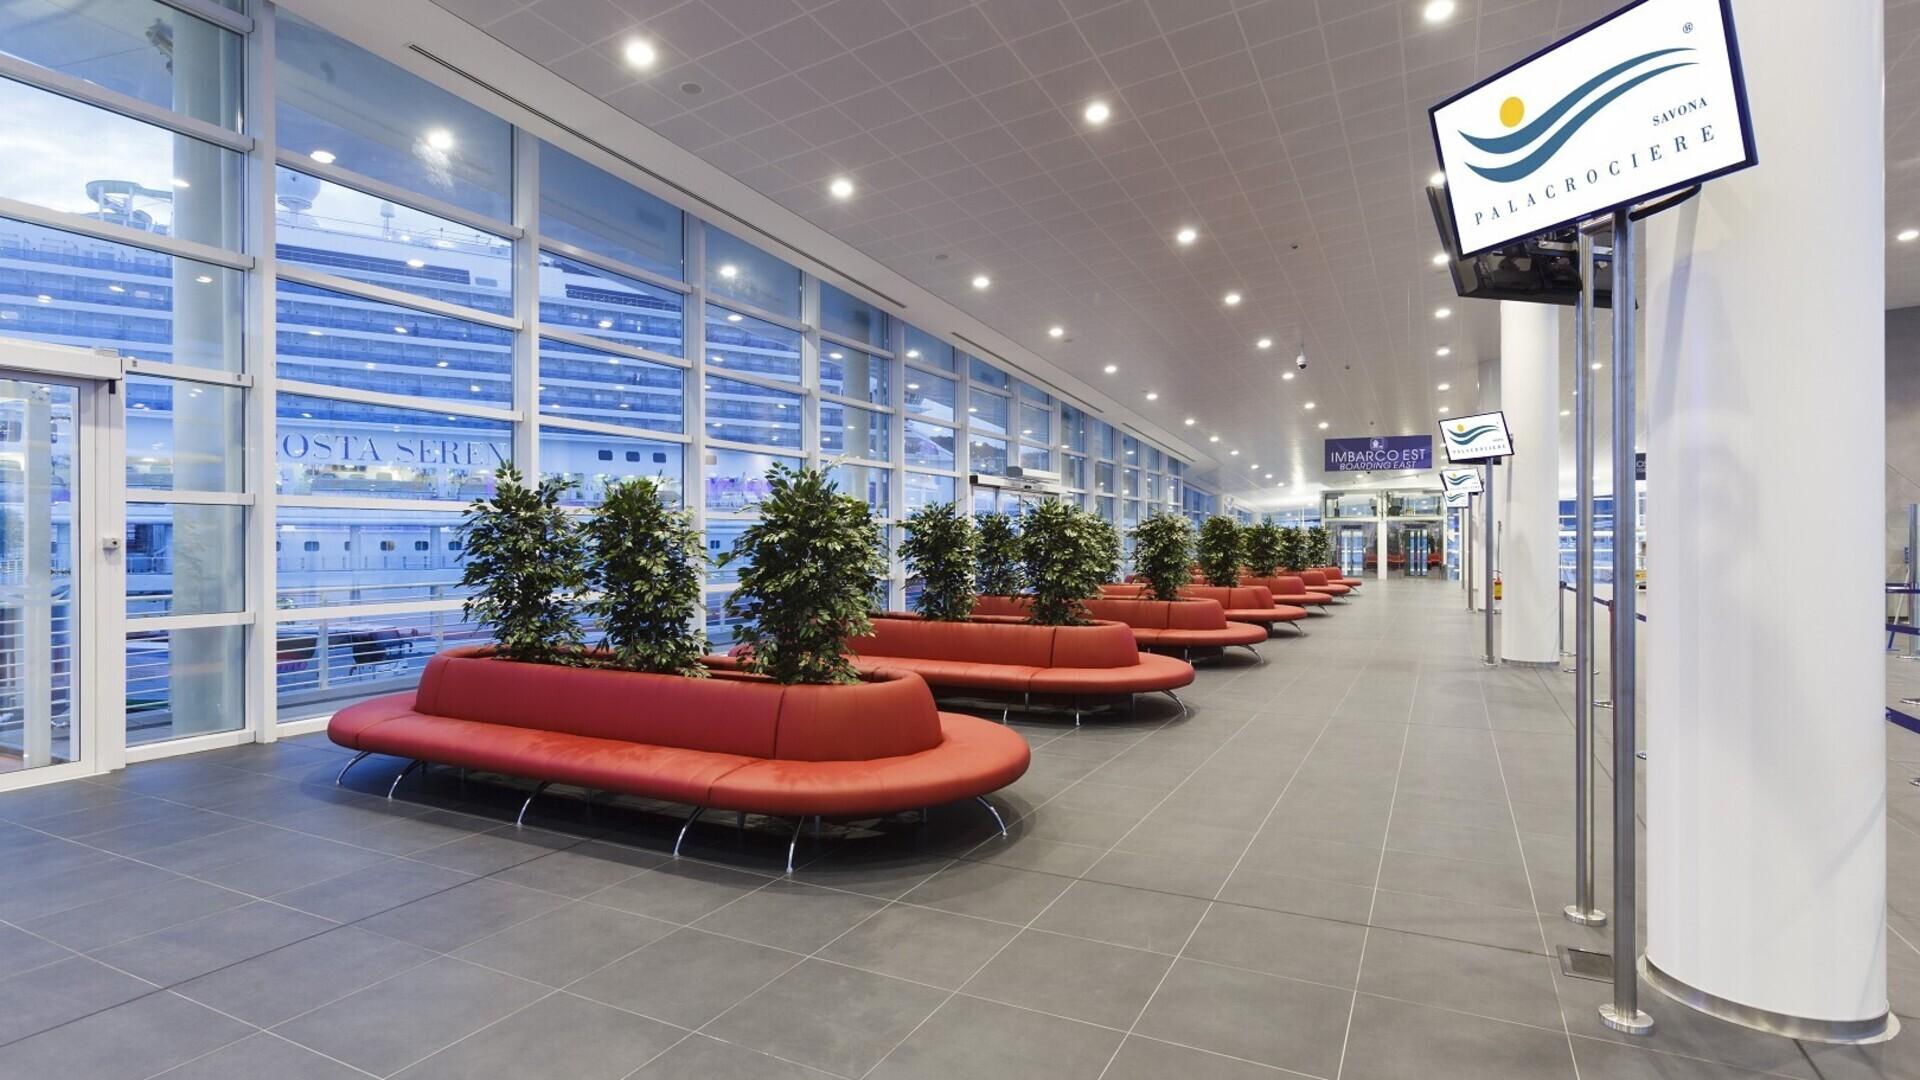 news article illustration, product introduction, product launch, rockfon metal, metal ceiling, metal tile, UK